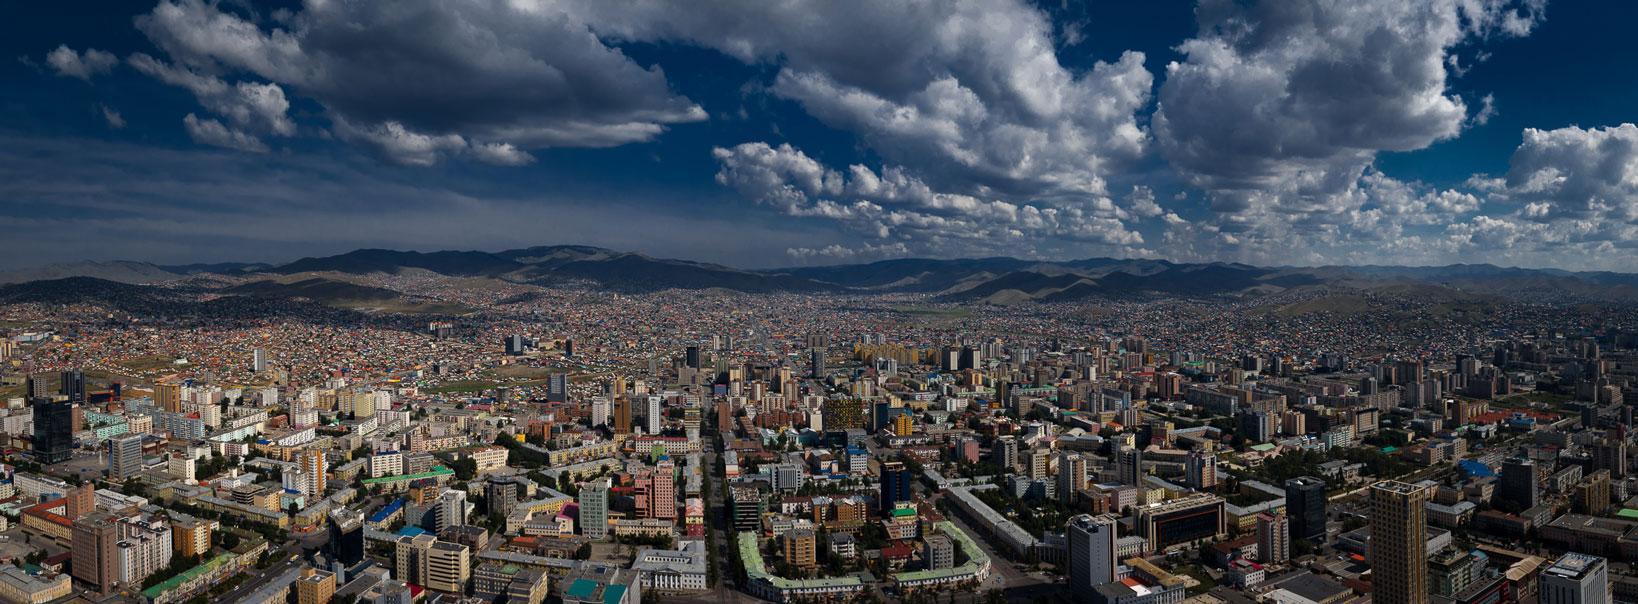 Mongolei, Hauptstadt Ulan Bator